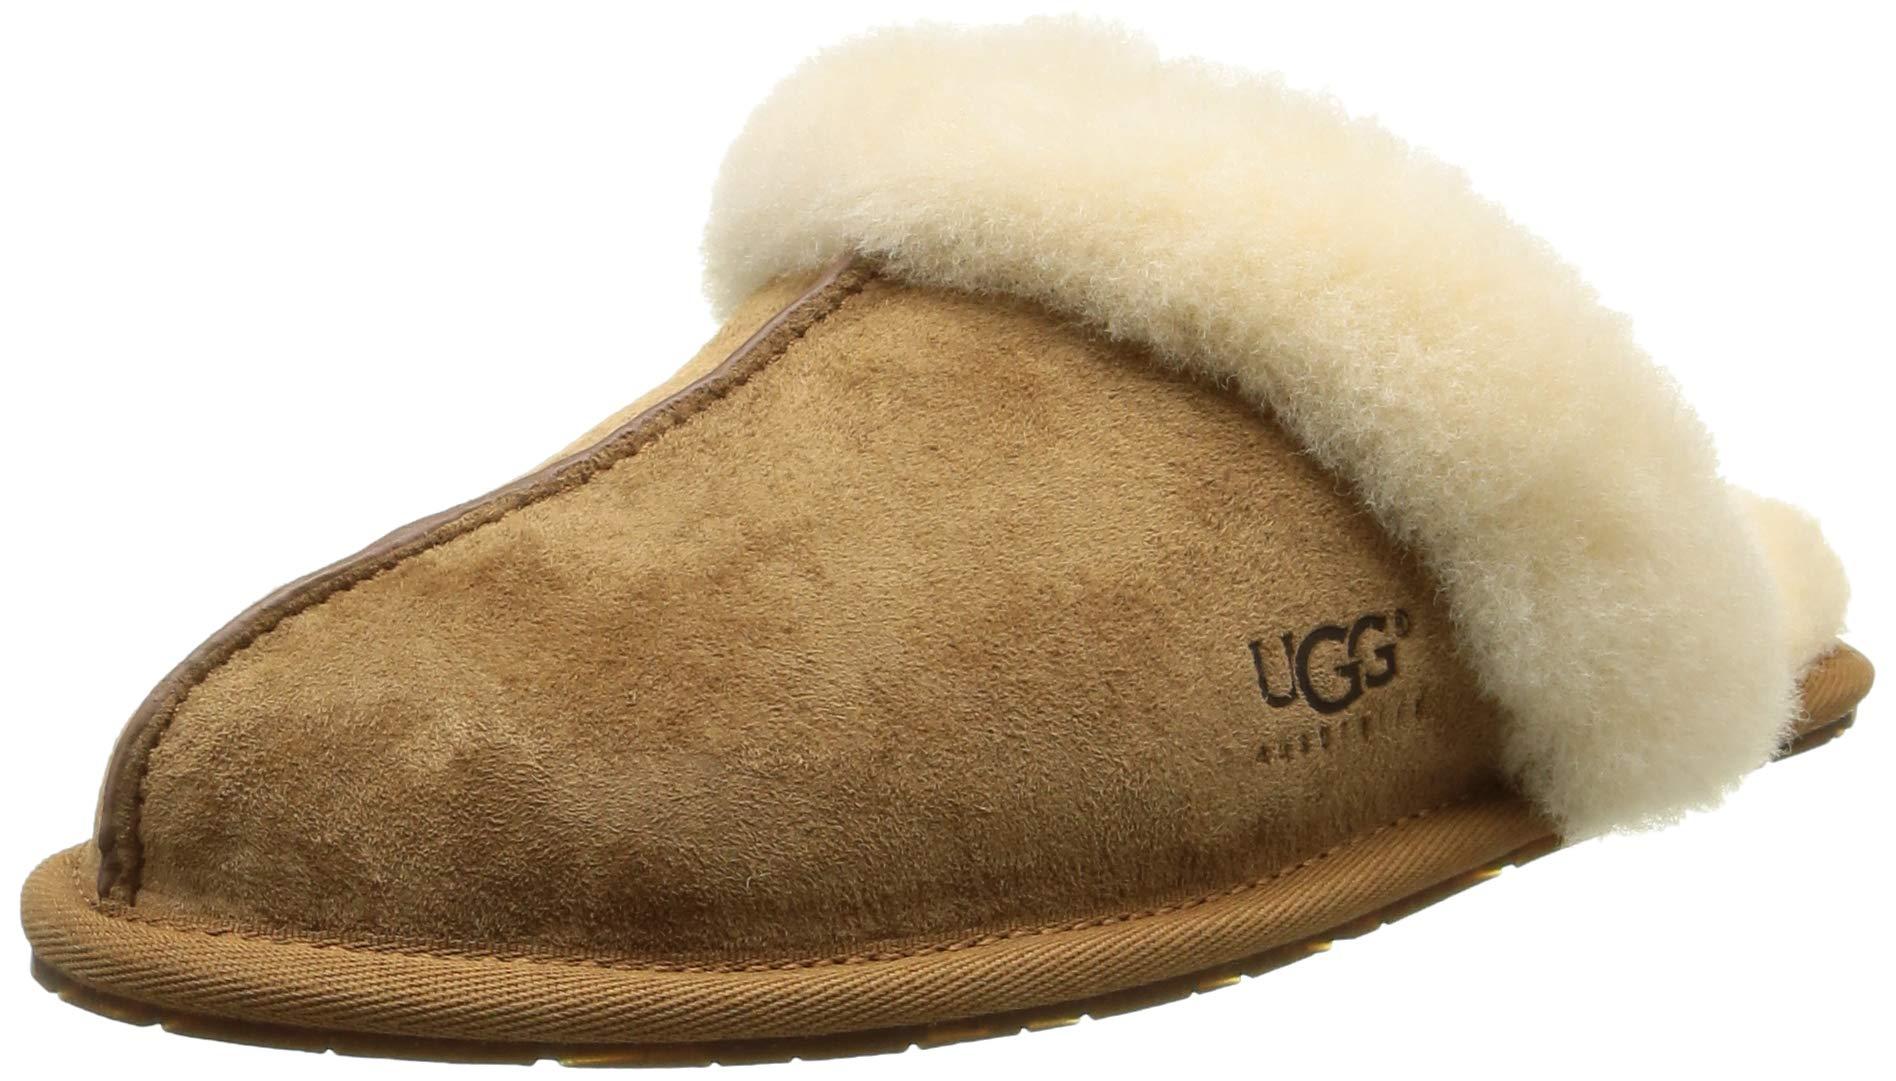 UGG Women's Scuffette II Scuff Slipper,Chestnut,8 US/8 B US by UGG